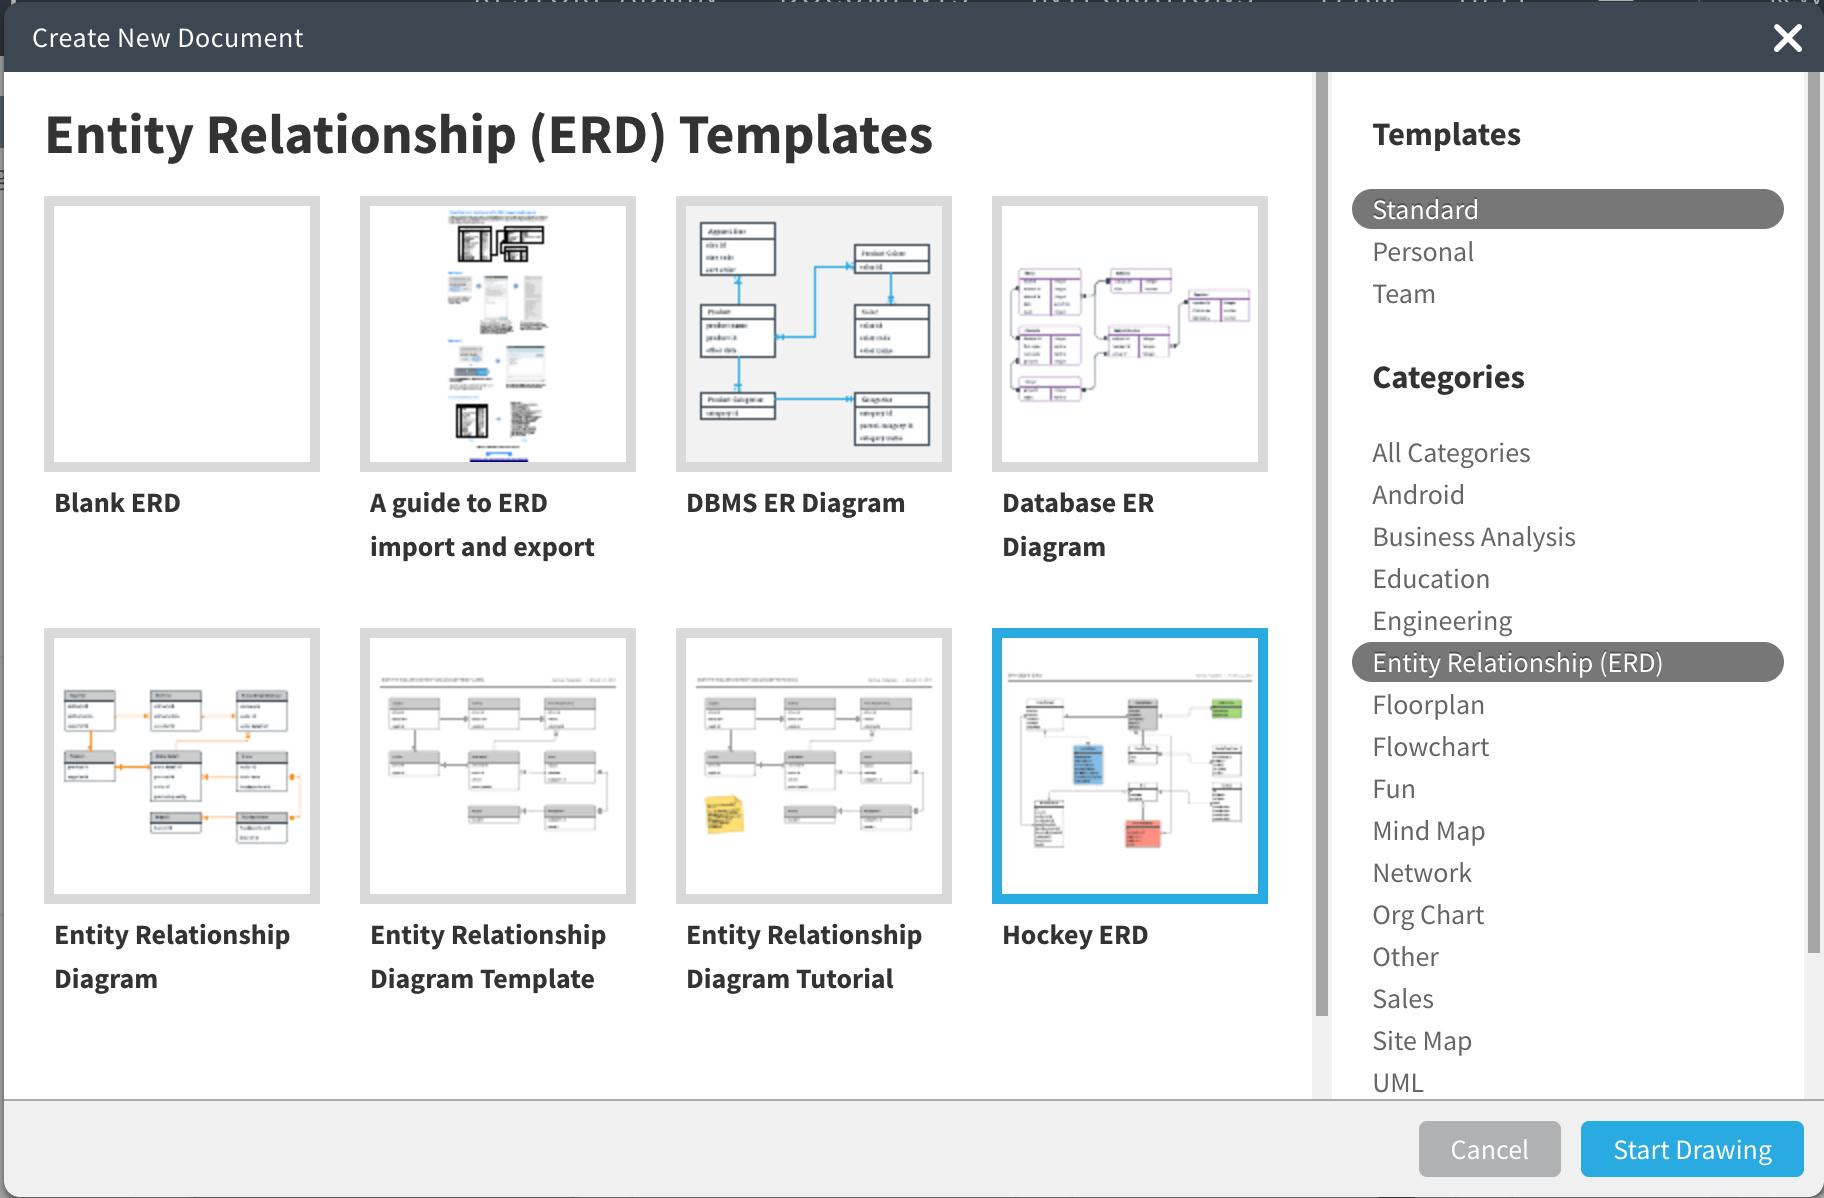 Erd Crm Project Template For A University W – Lucidchart regarding Er Diagram Visio Template